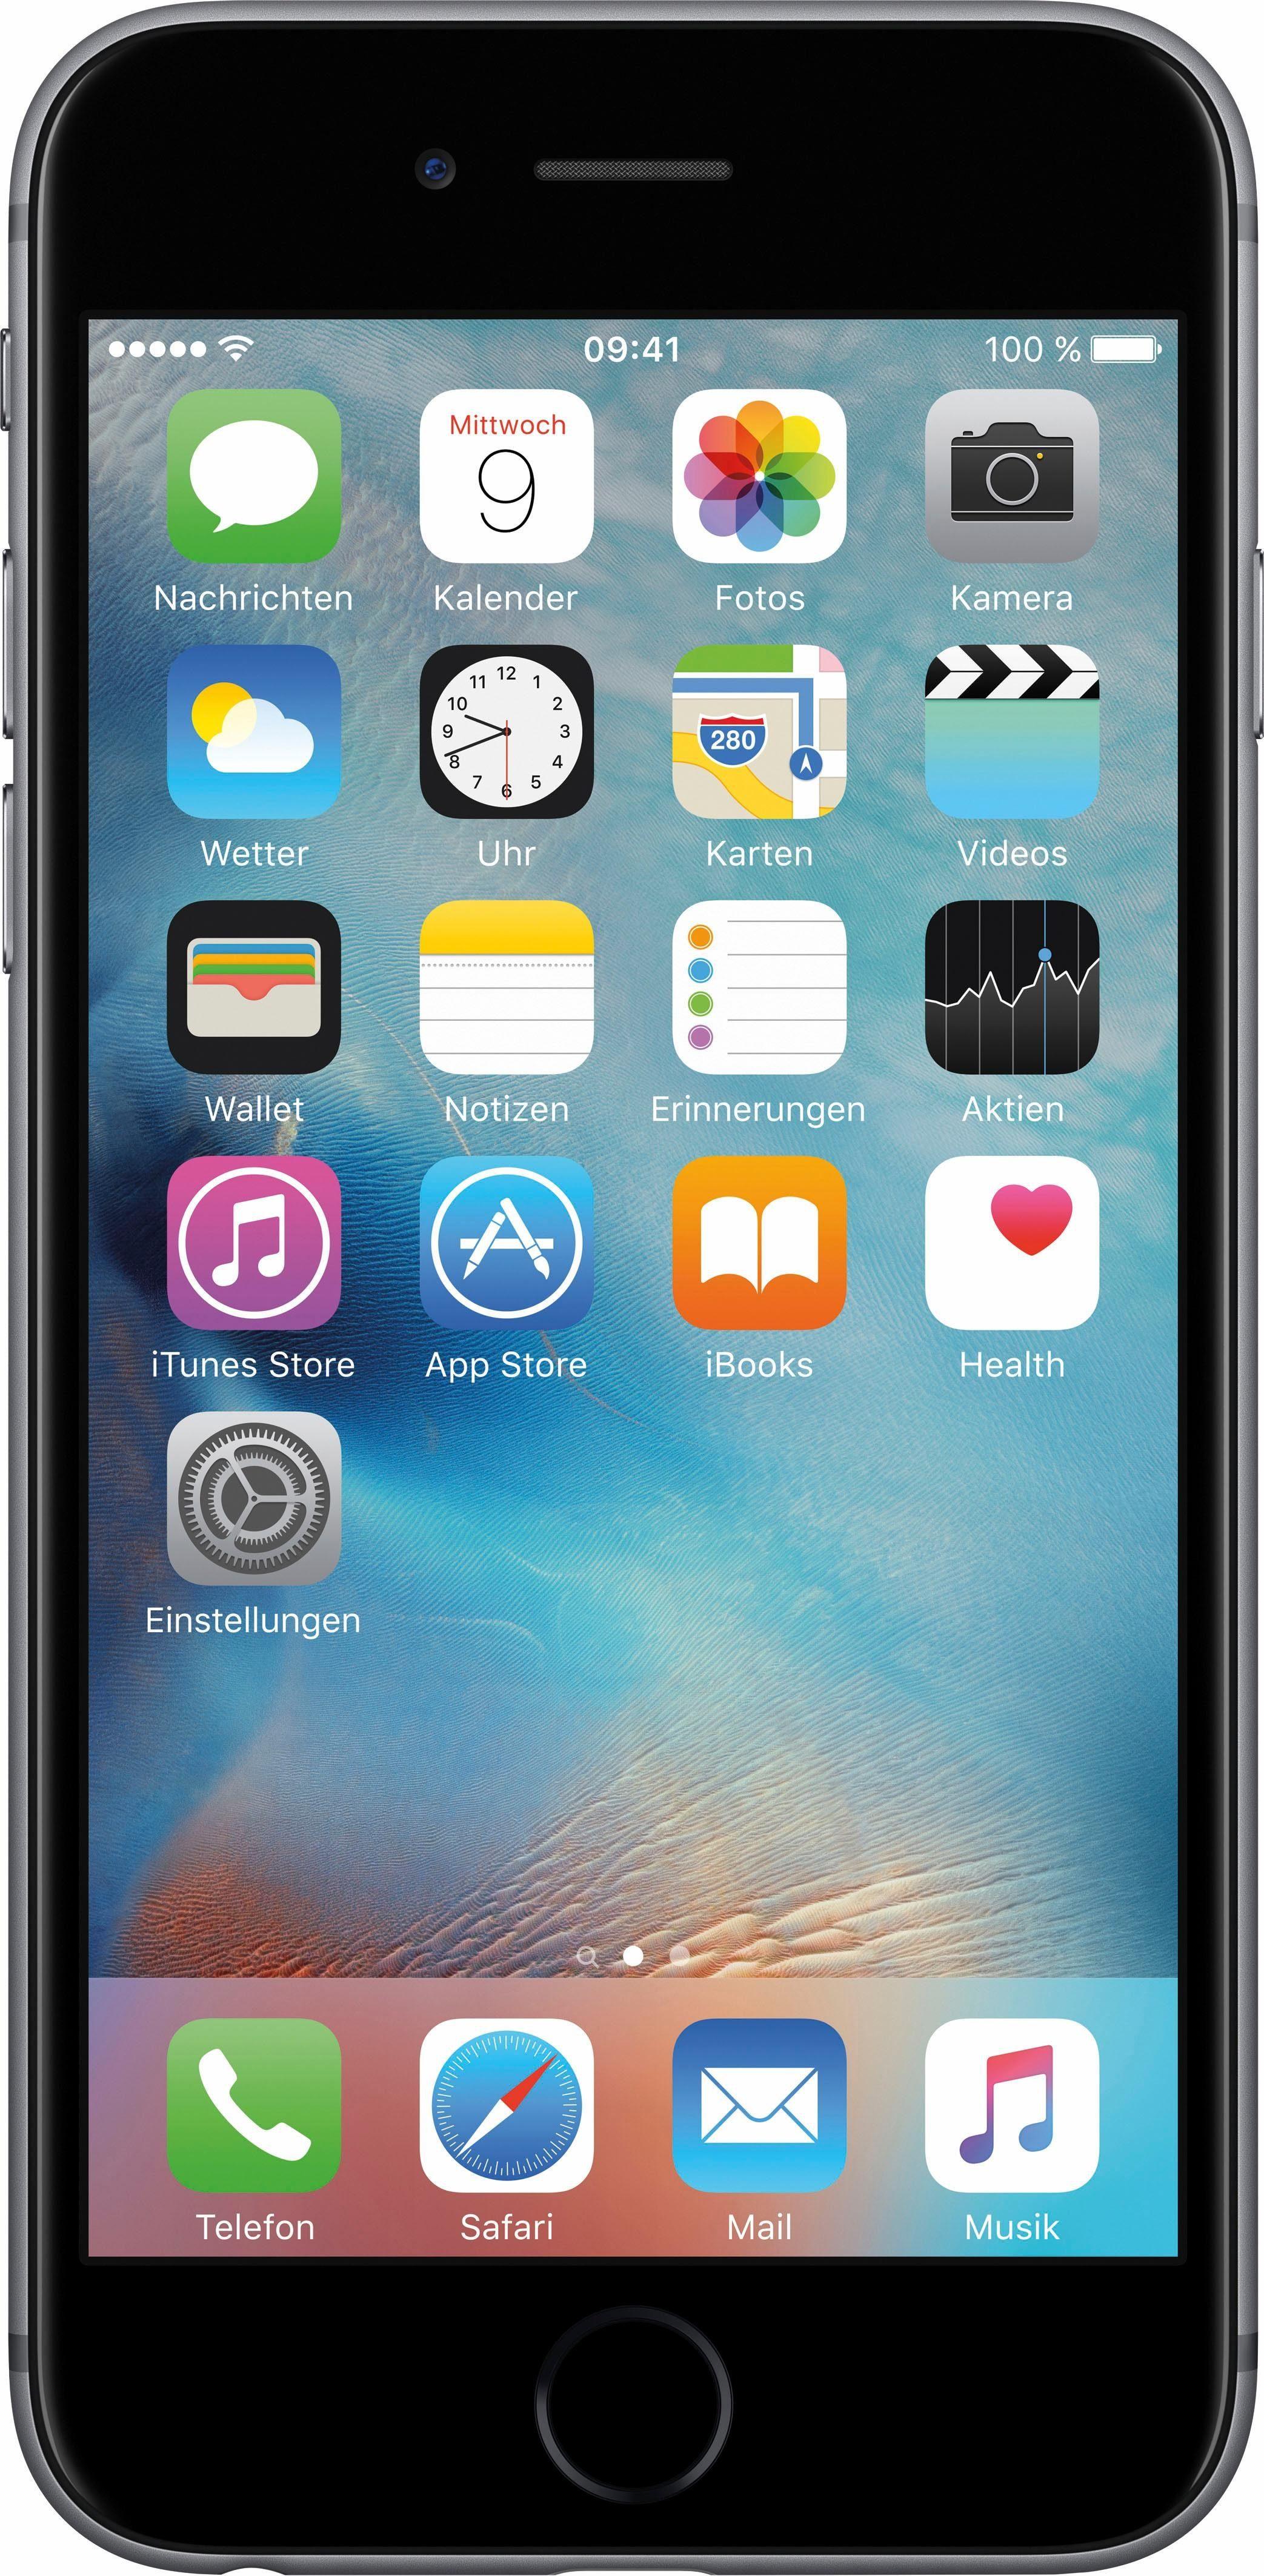 "Apple Apple iPhone 6s 4,7"" 32 GB iPhone 6s (12 cm/4,7 Zoll, 32 GB Speicherplatz)"